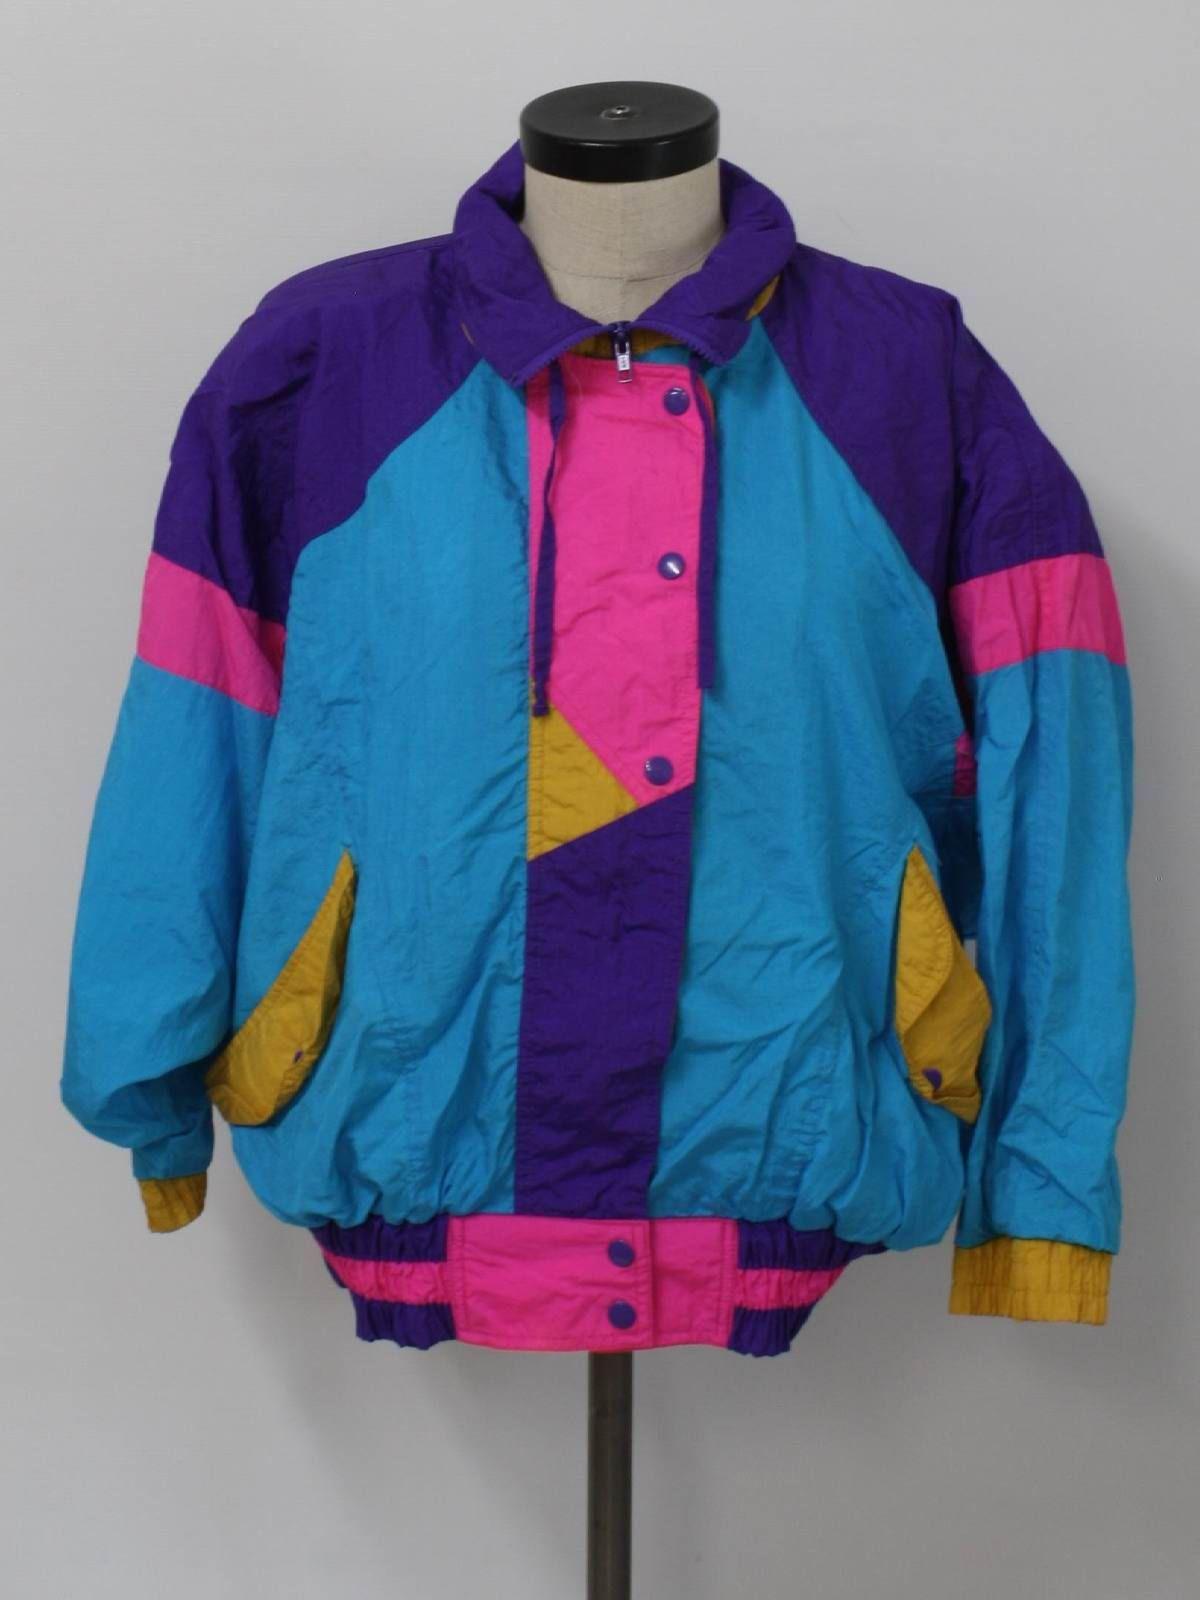 Pin On Vintage 90s Fashion